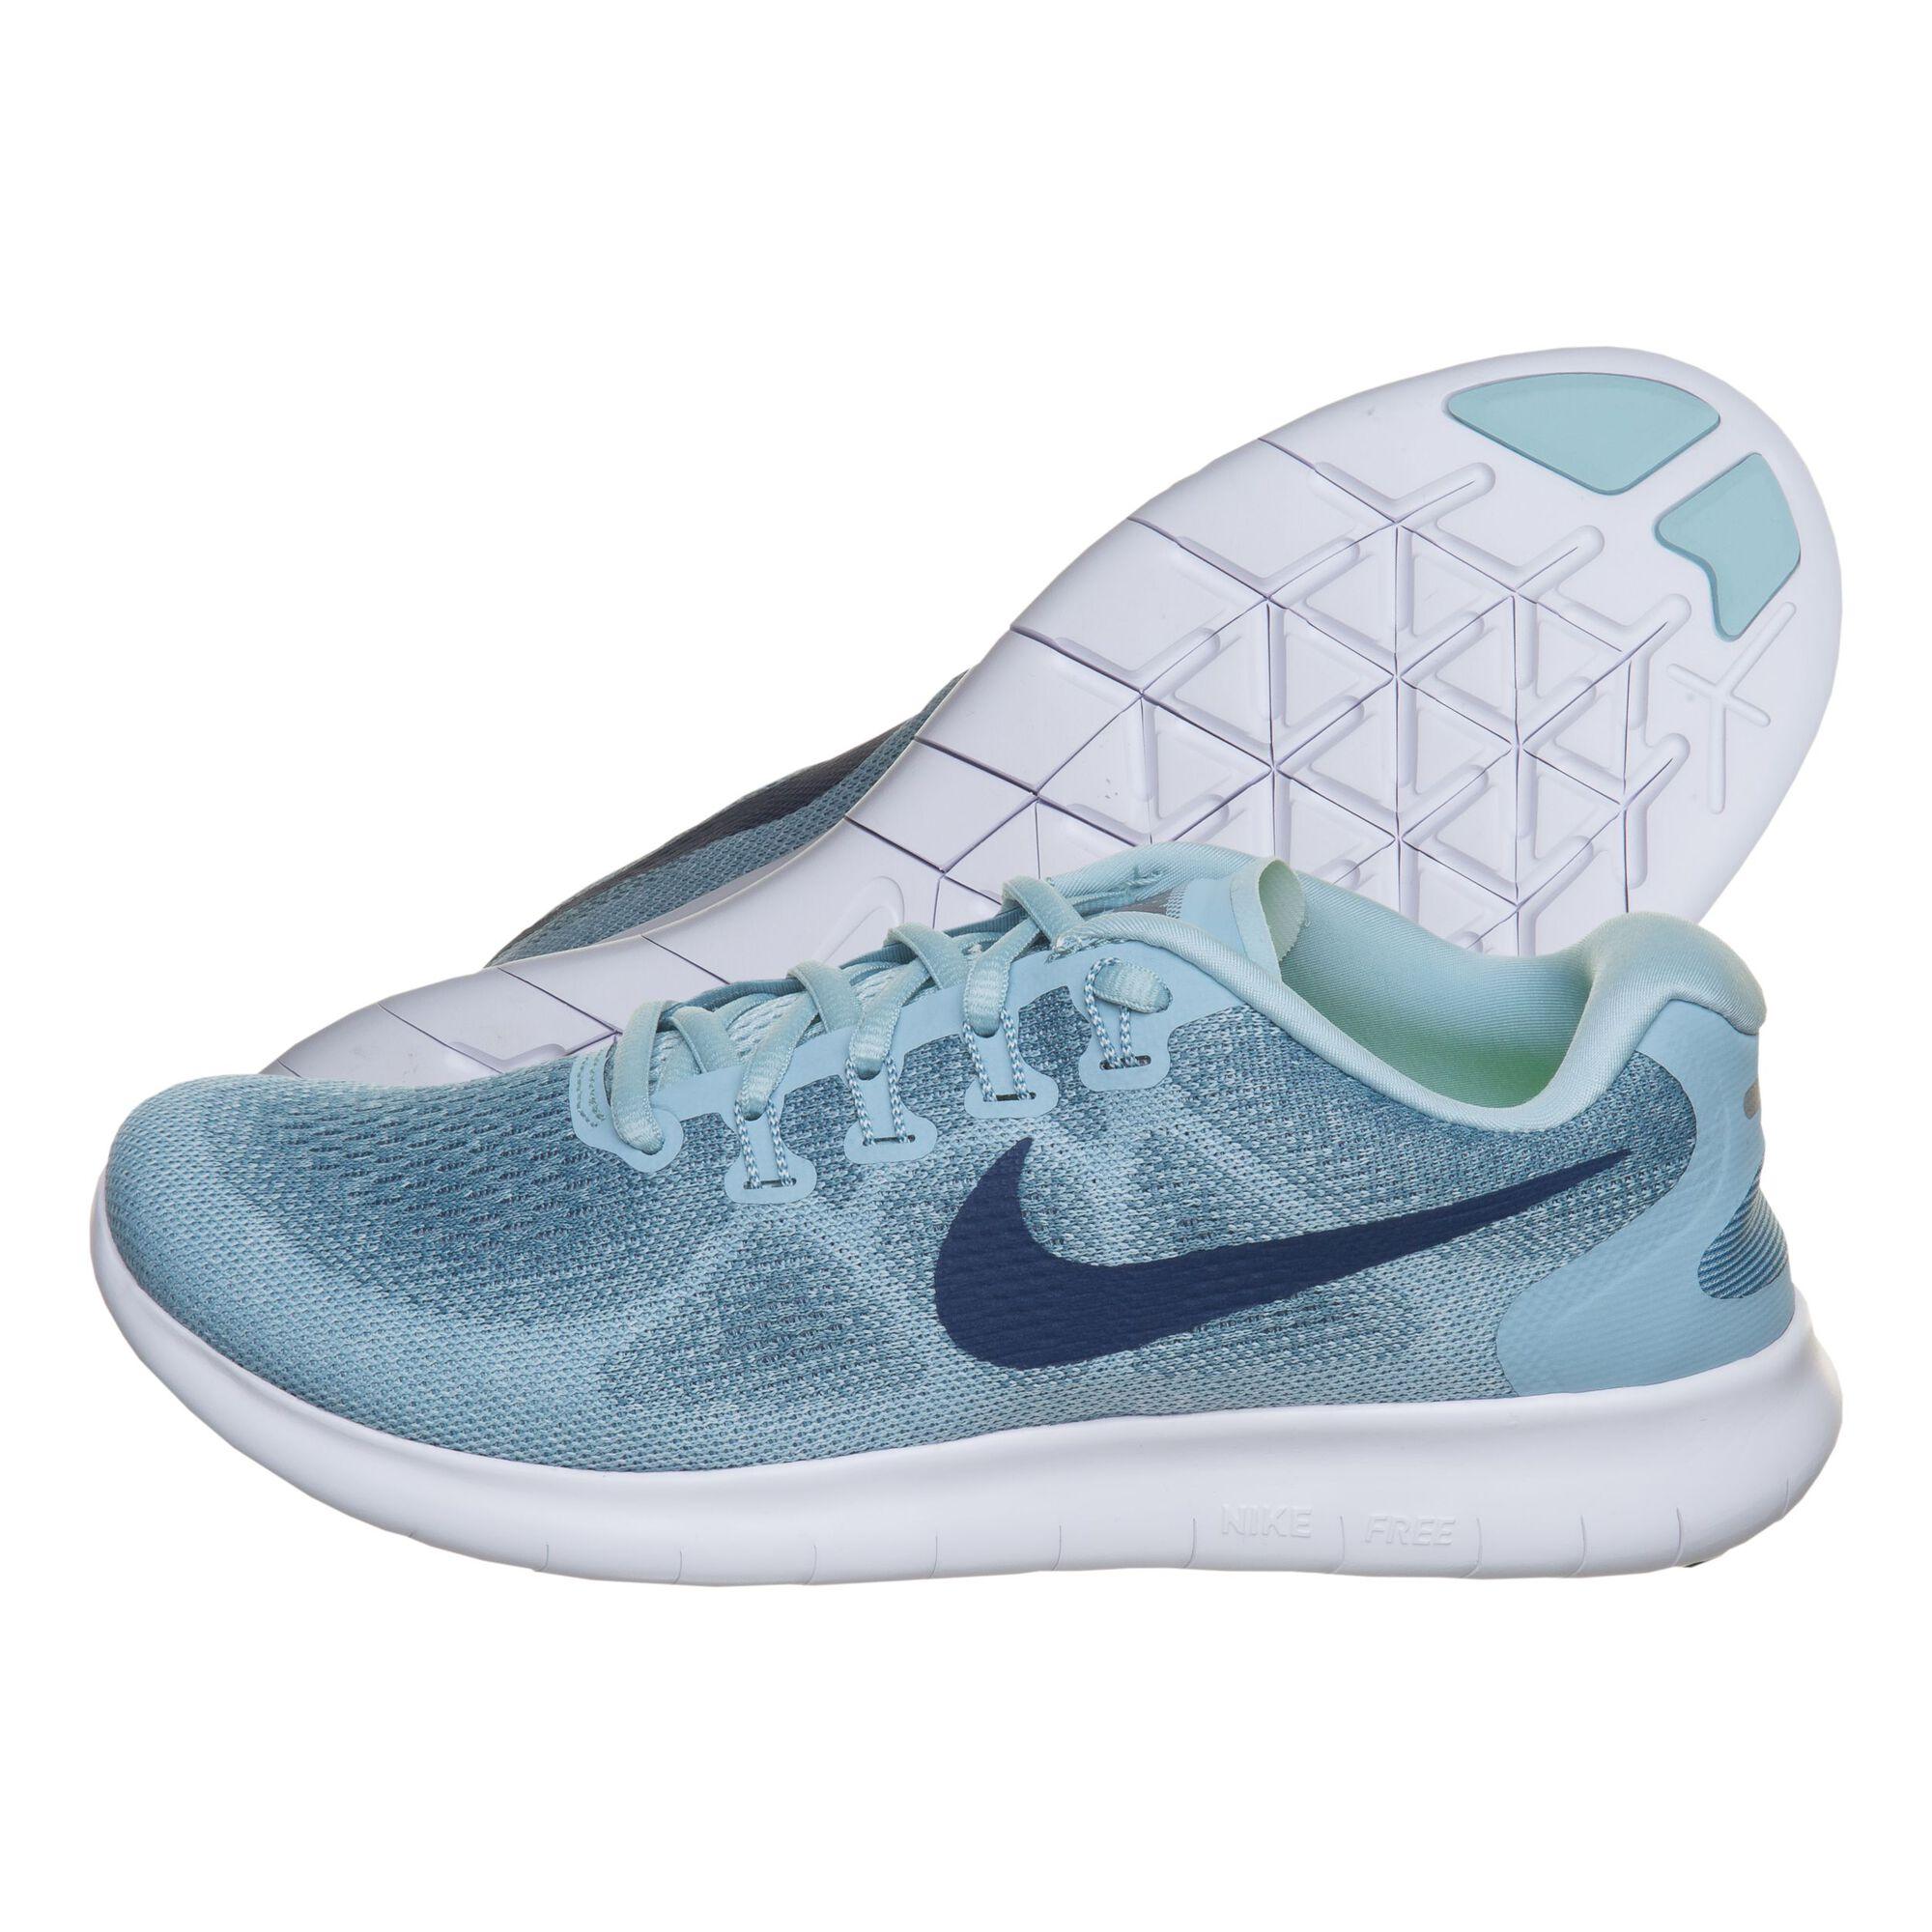 820f4cd68405 buy Nike Free Run Flyknit 2017 Natural Running Shoe Women - Light ...